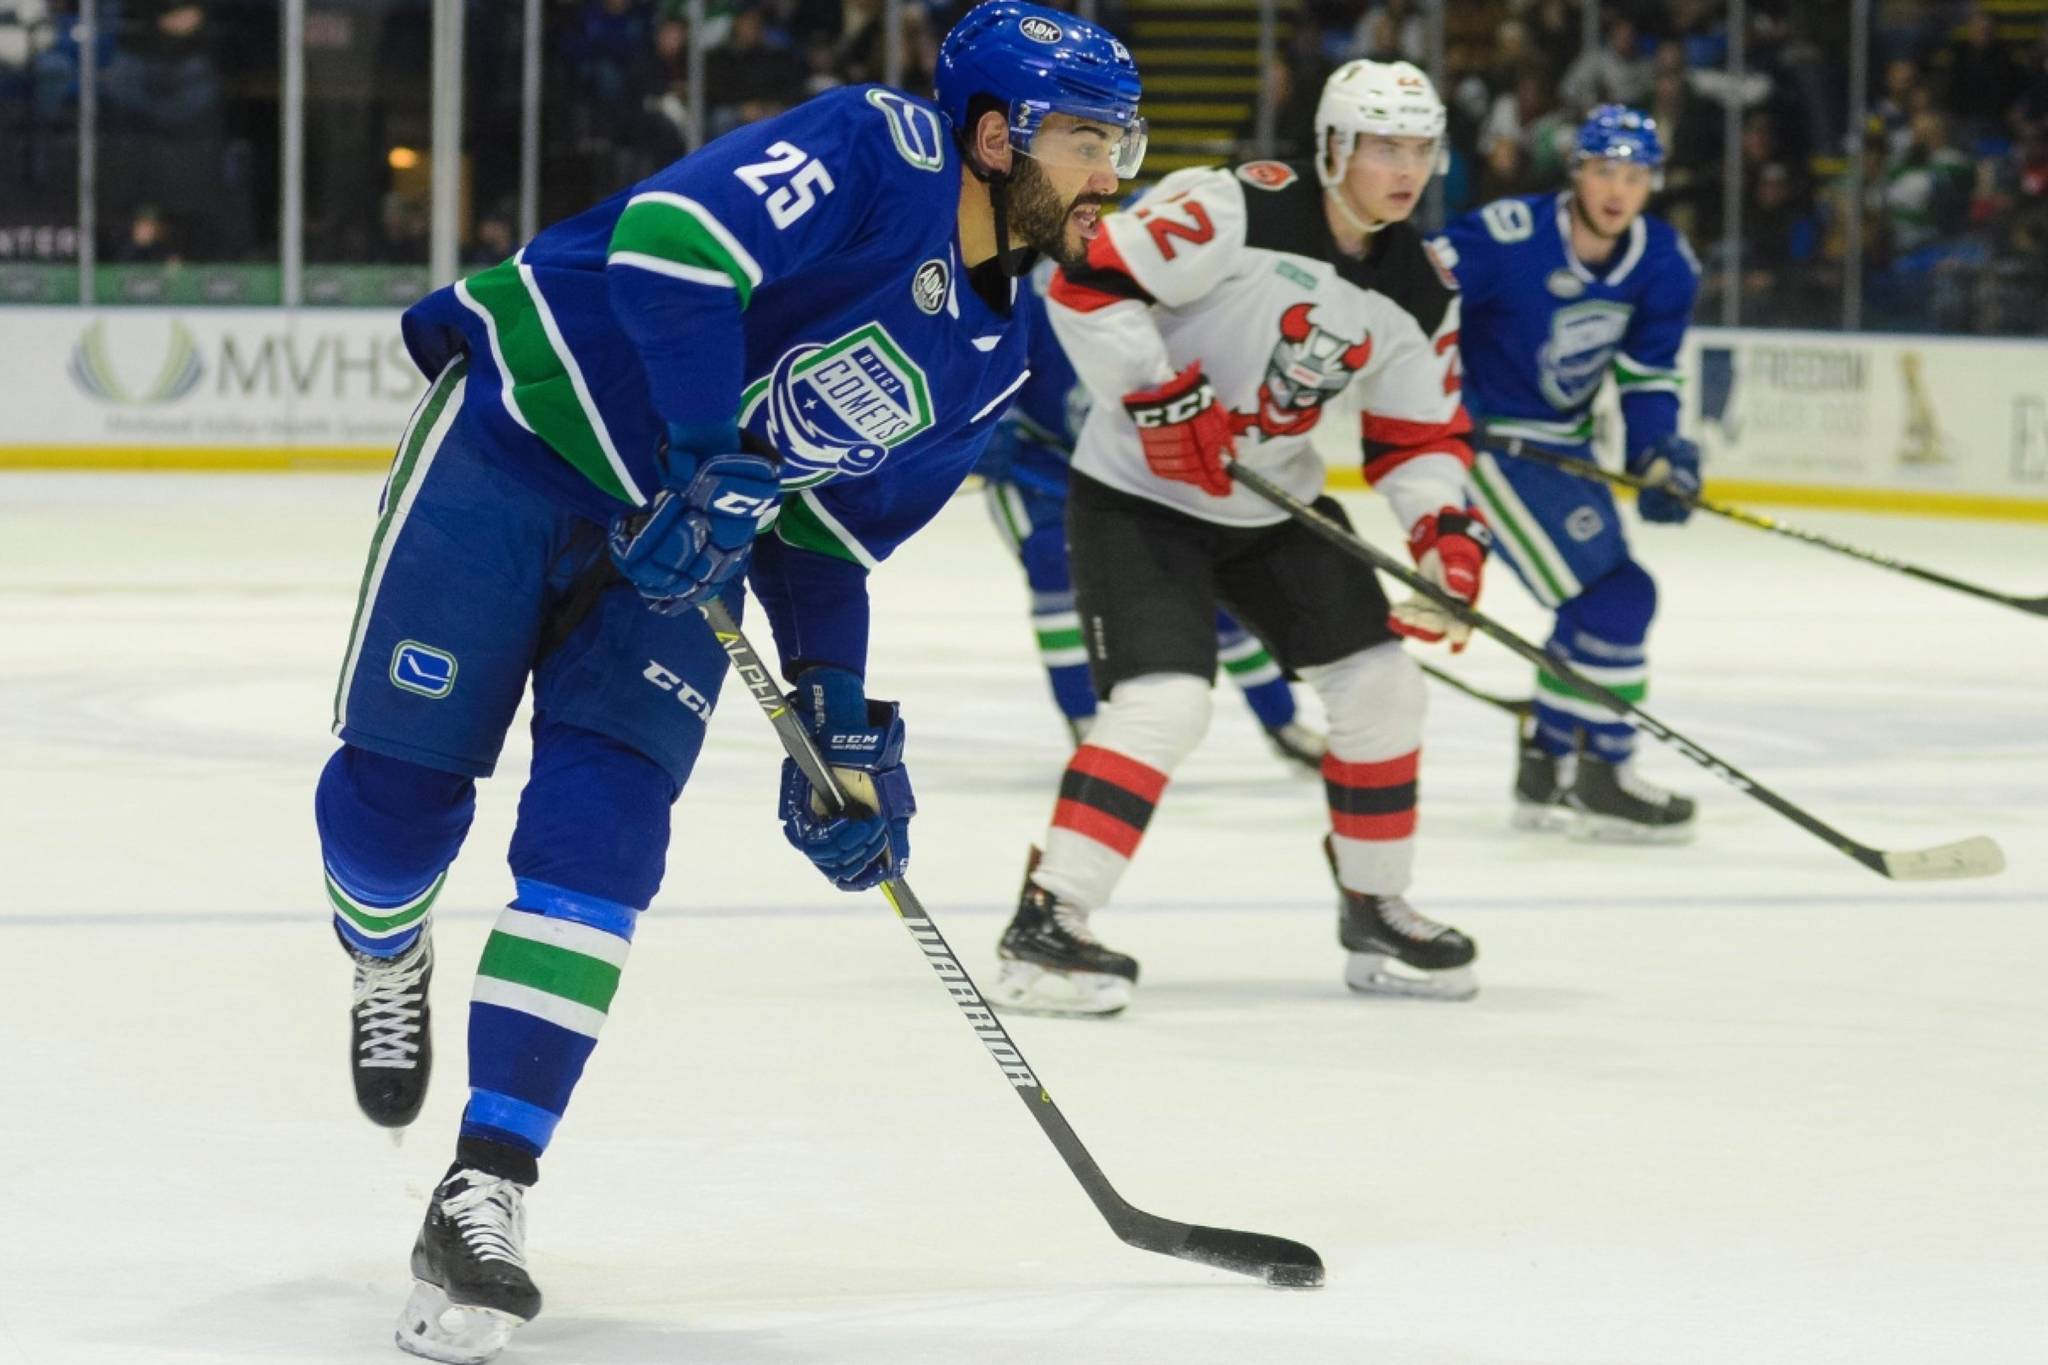 Canucks deal Nilsson and Archibald to Senators for McKenna, Pyatt, draft pick